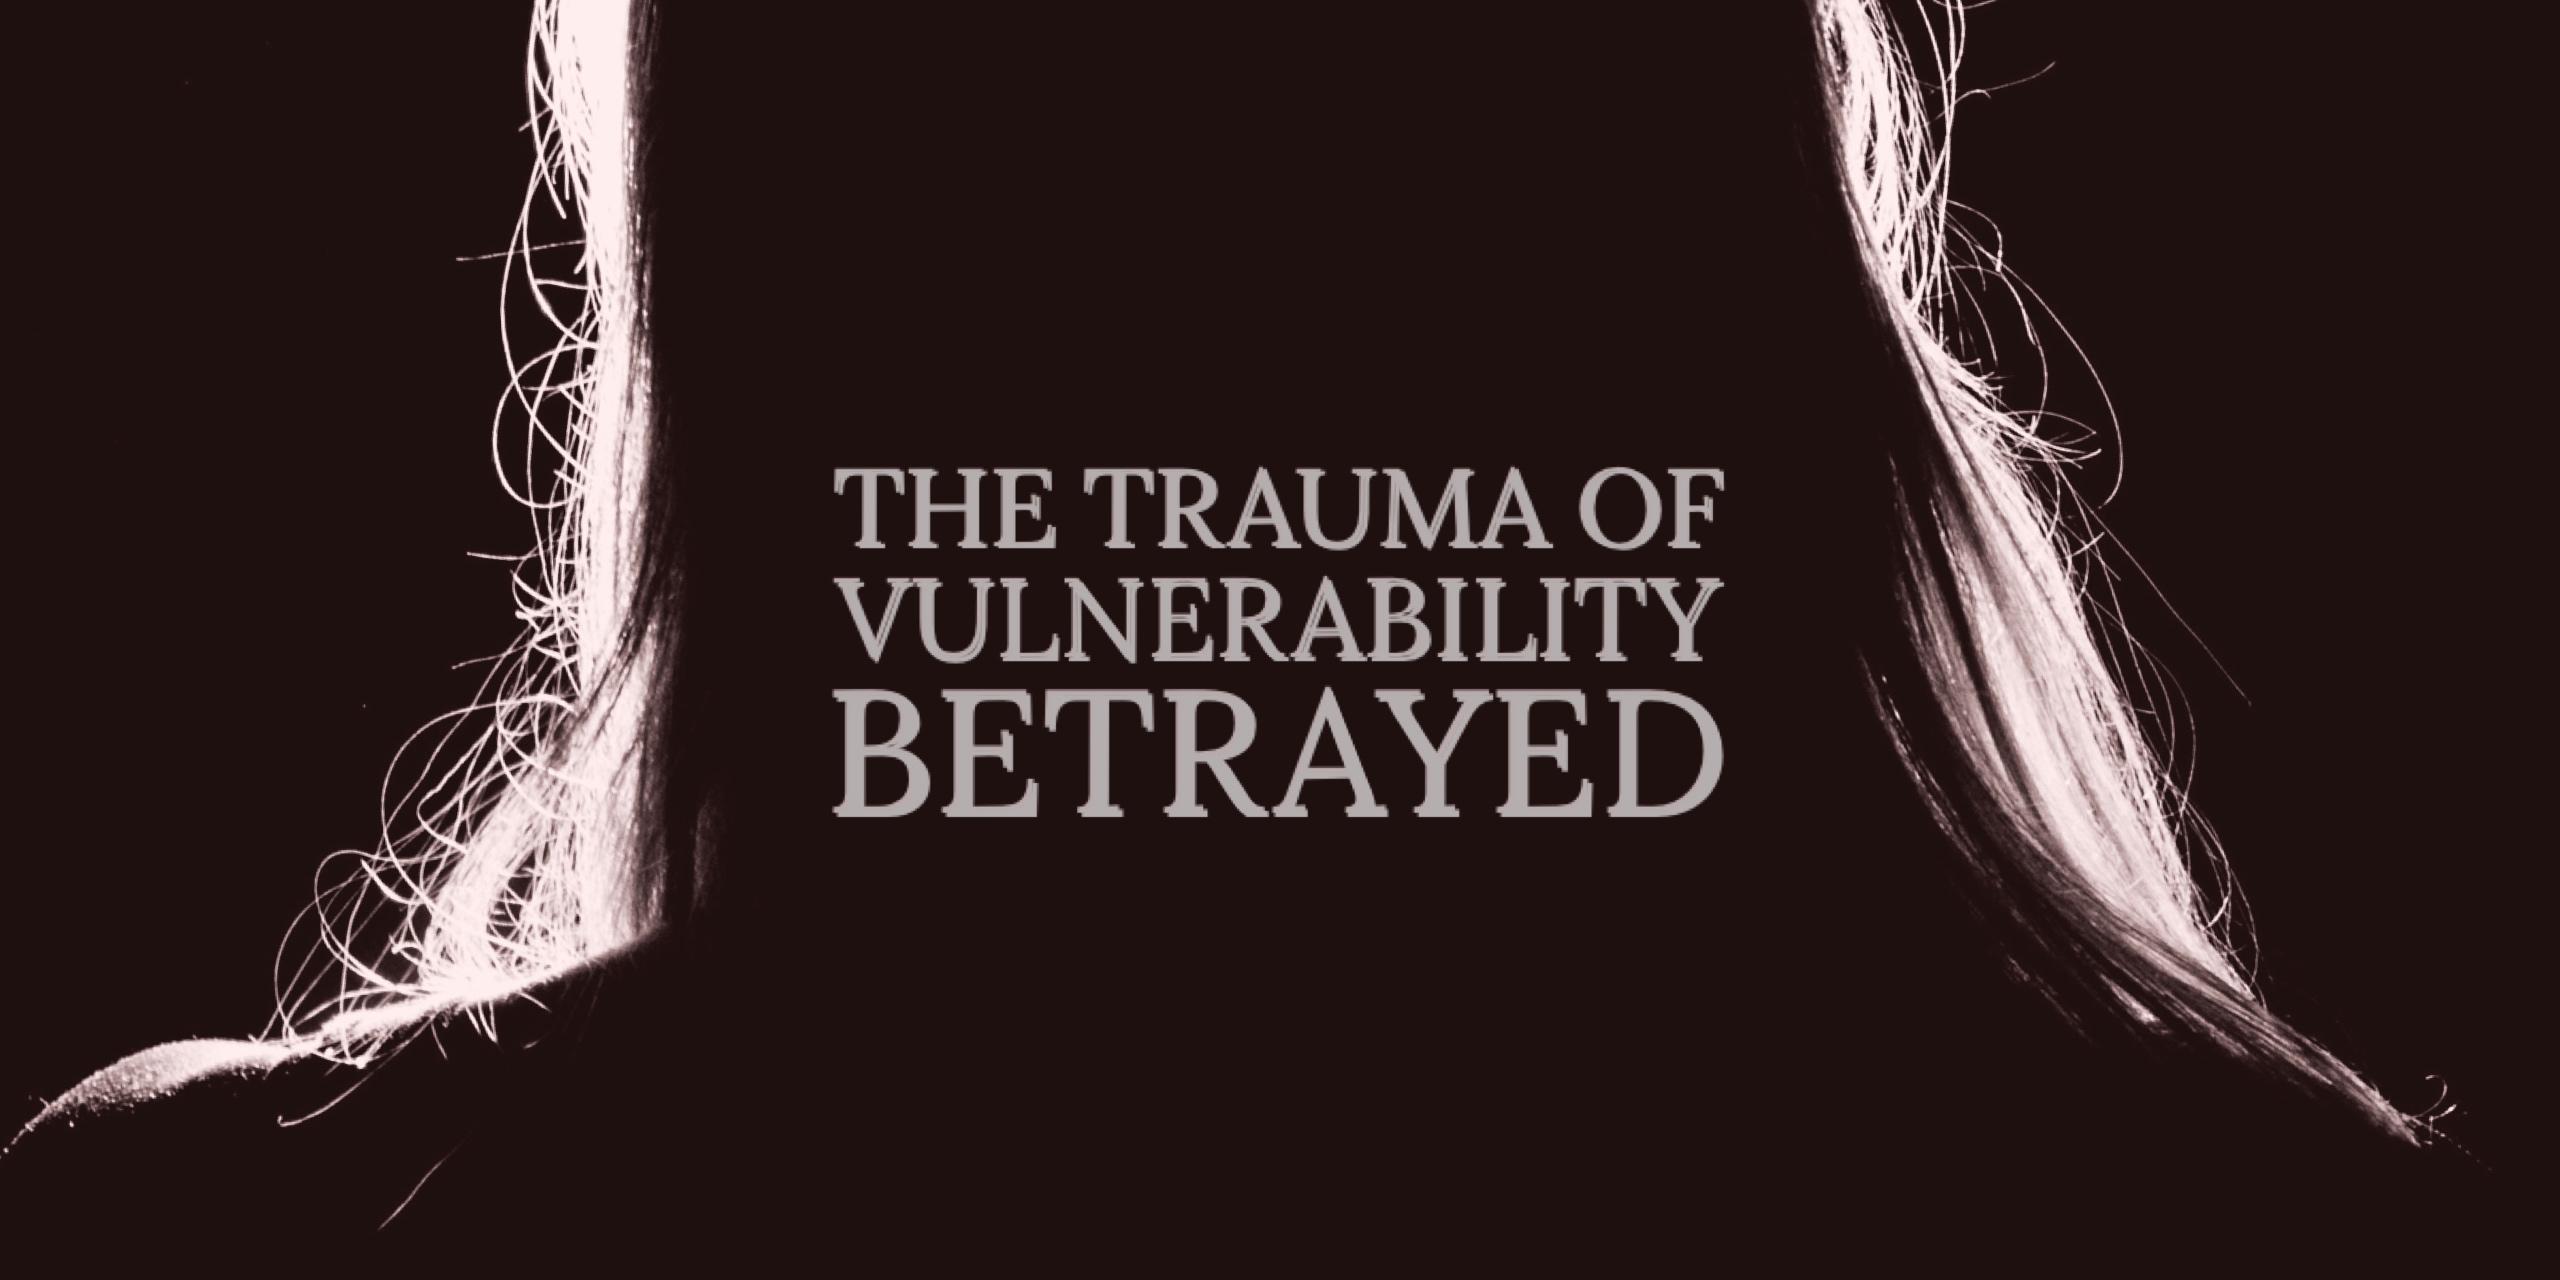 The Trauma of Vulnerability Betrayed